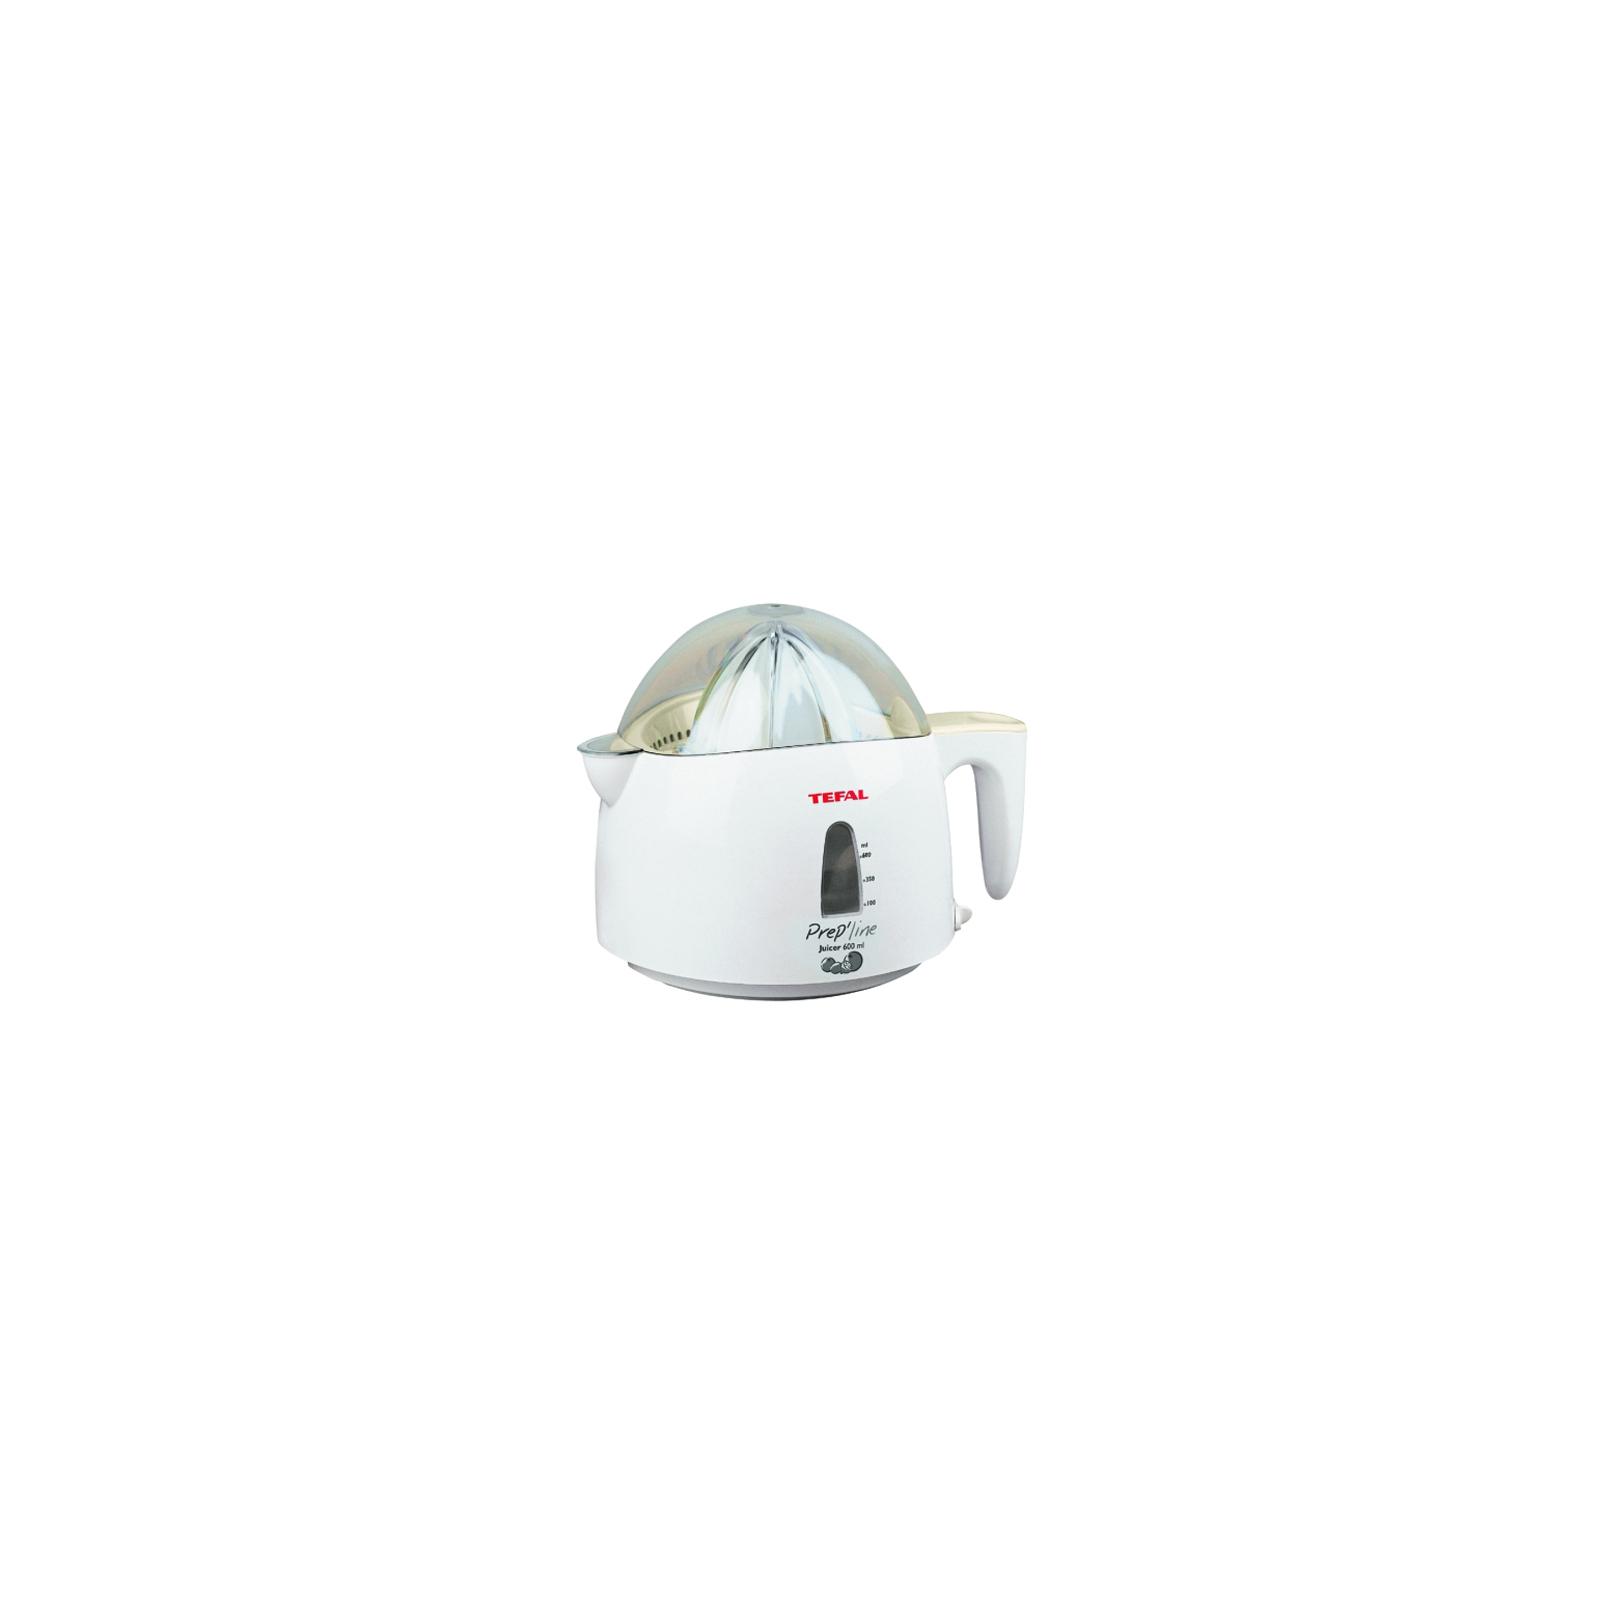 Соковыжималка TEFAL 8309 (8309 31)